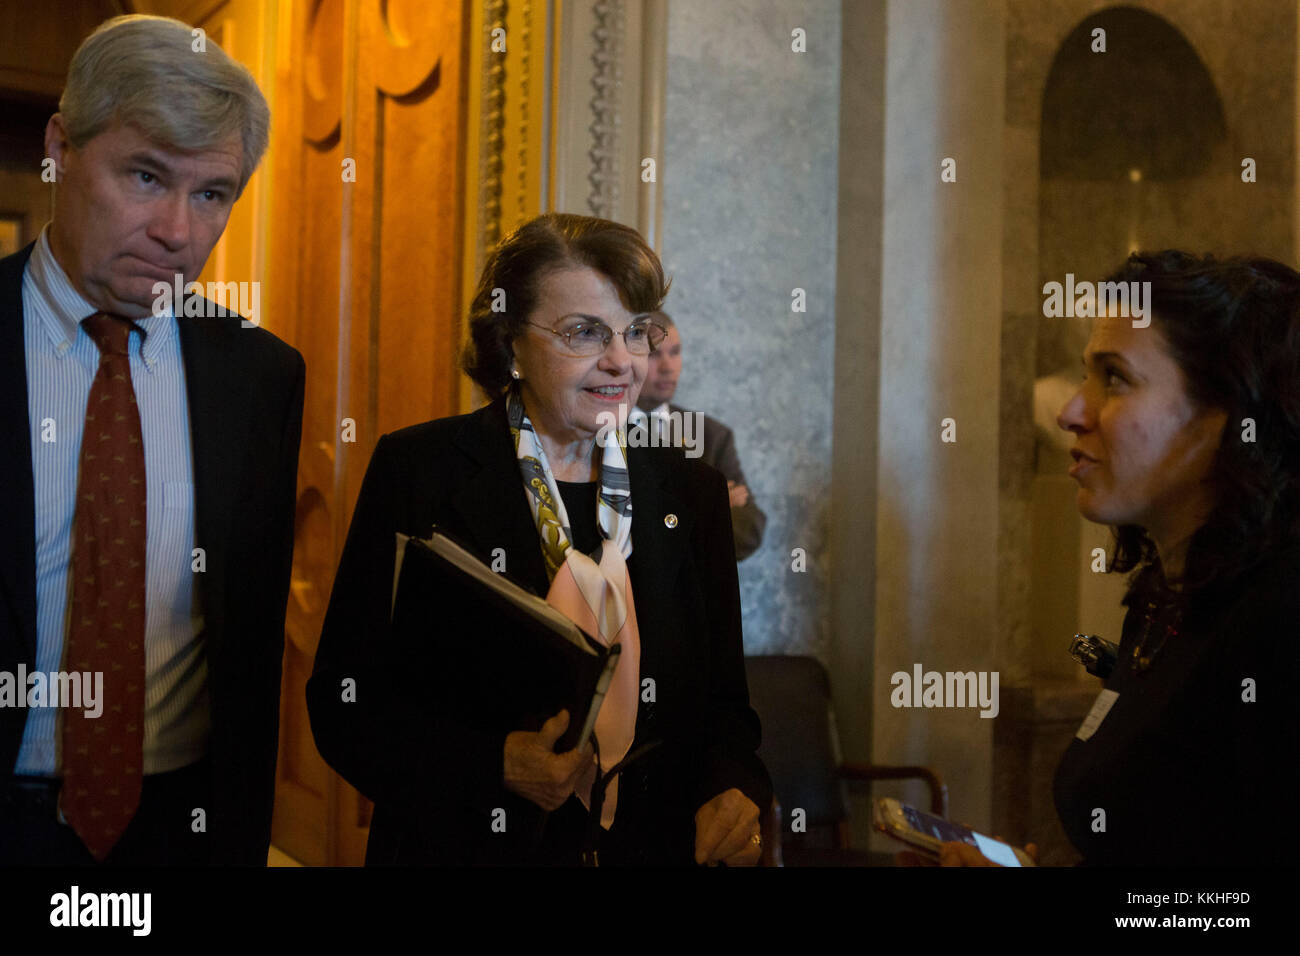 United States Senator Dianne Feinstein (Democrat of California) and US Senator Sheldon Whitehouse (Democrat of Rhode - Stock Image